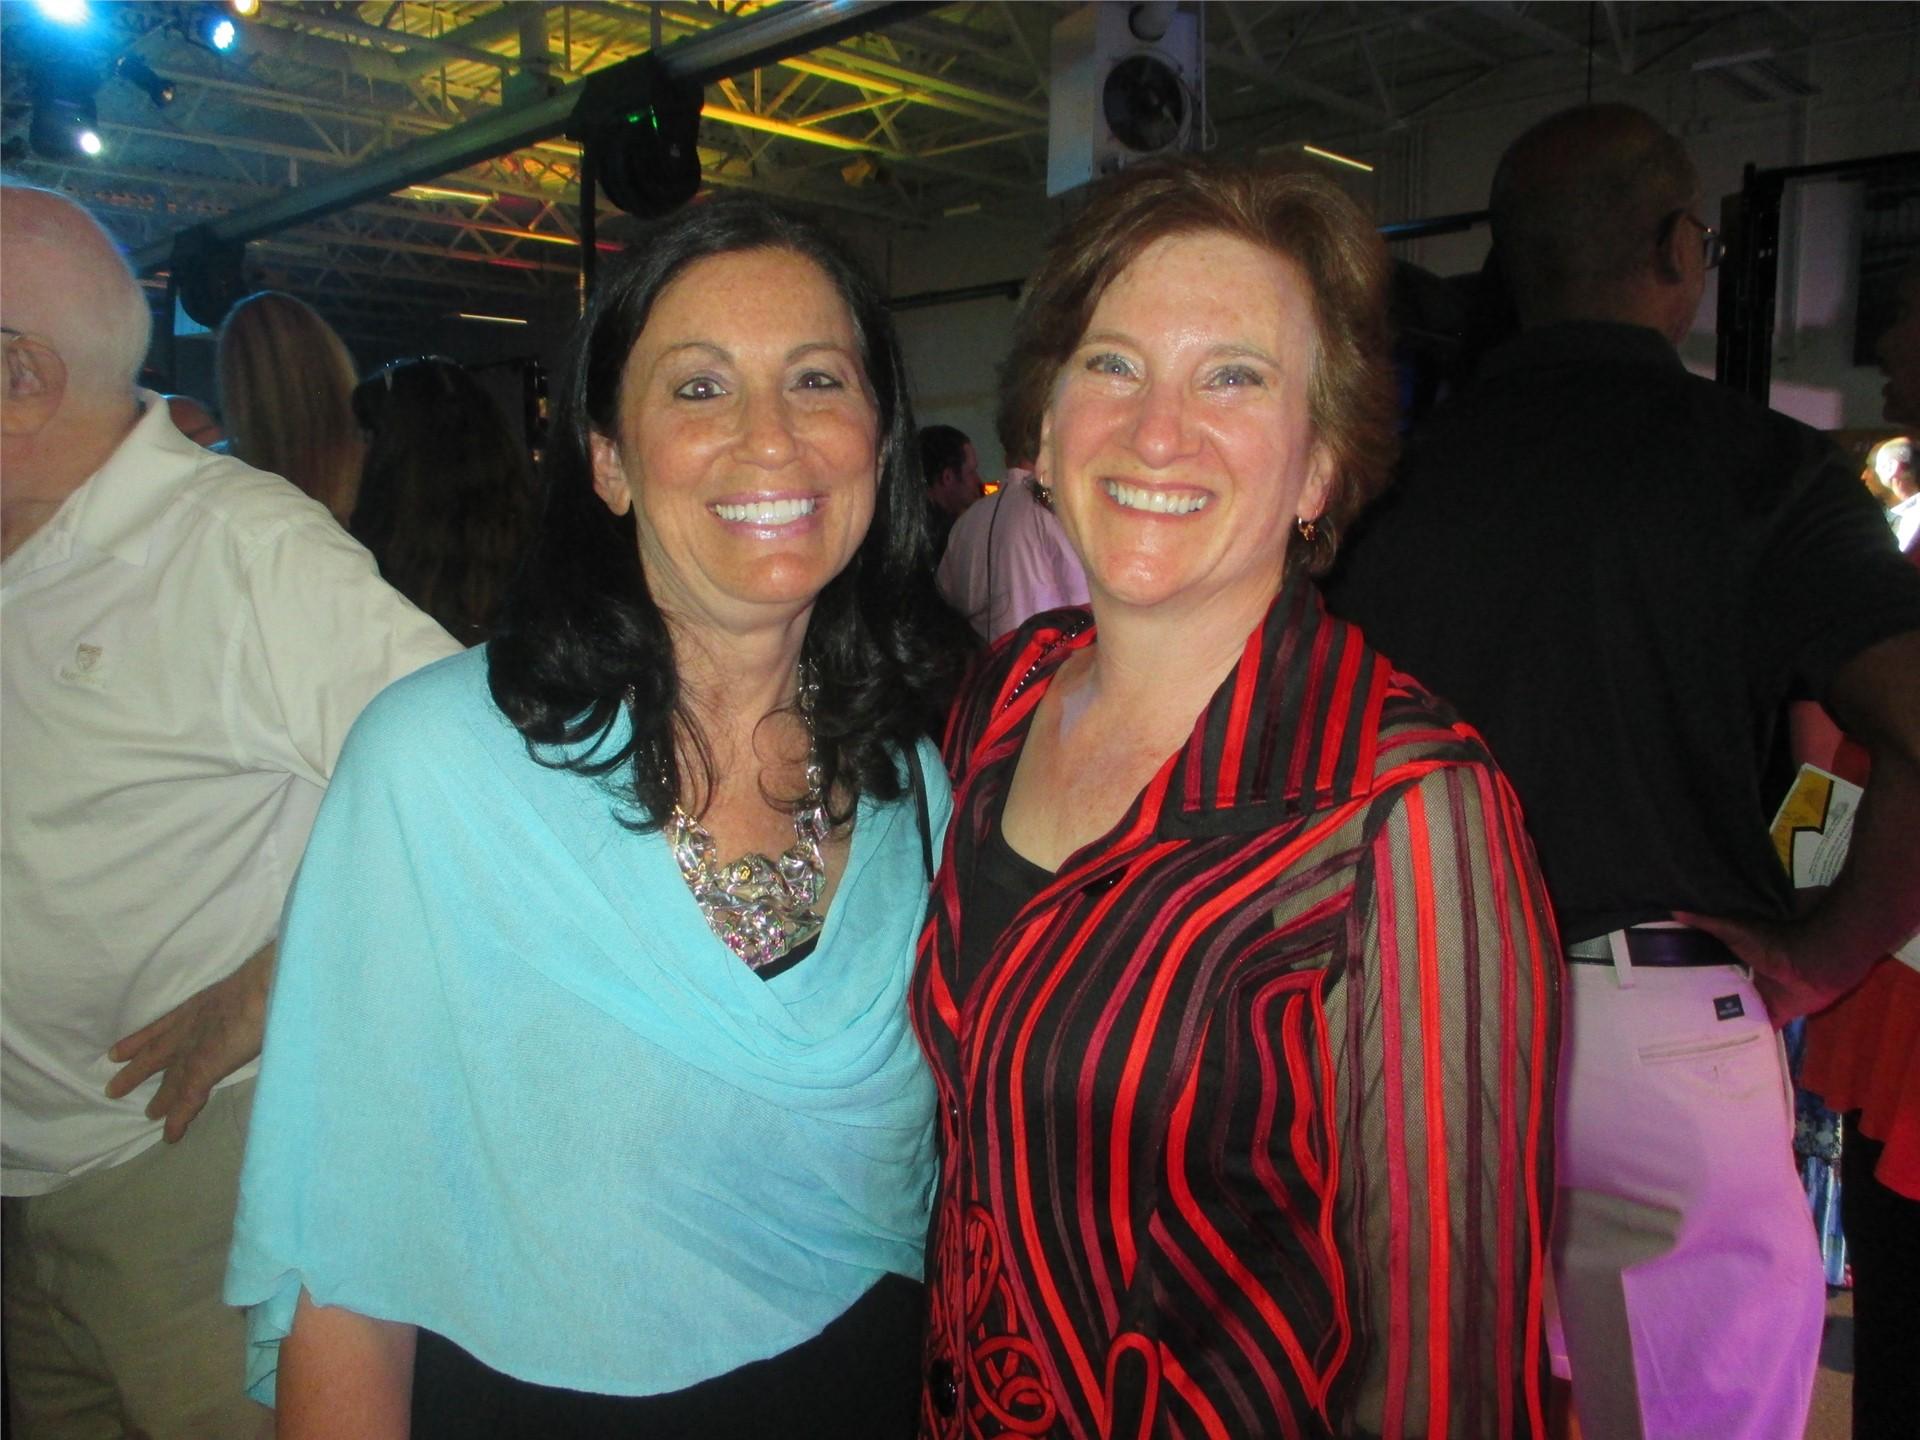 Barb Janovitz and Erica Remer